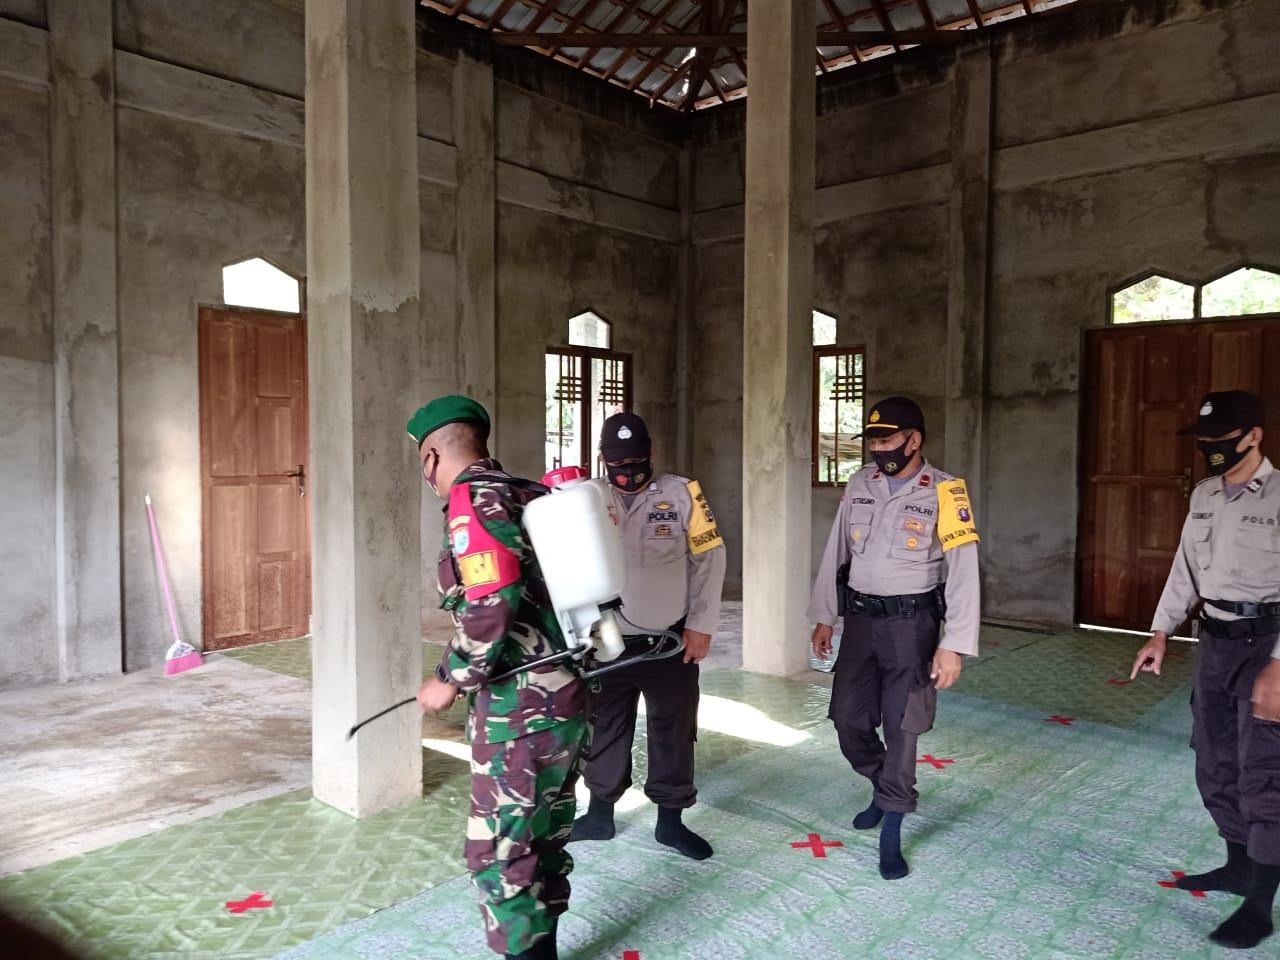 Menghindari Penyebaran Virus  Covid-19 Polsek Tanah Siang dan TNI Semprotkan Cairan Disinfektan di Tempat-tempat Ibadah